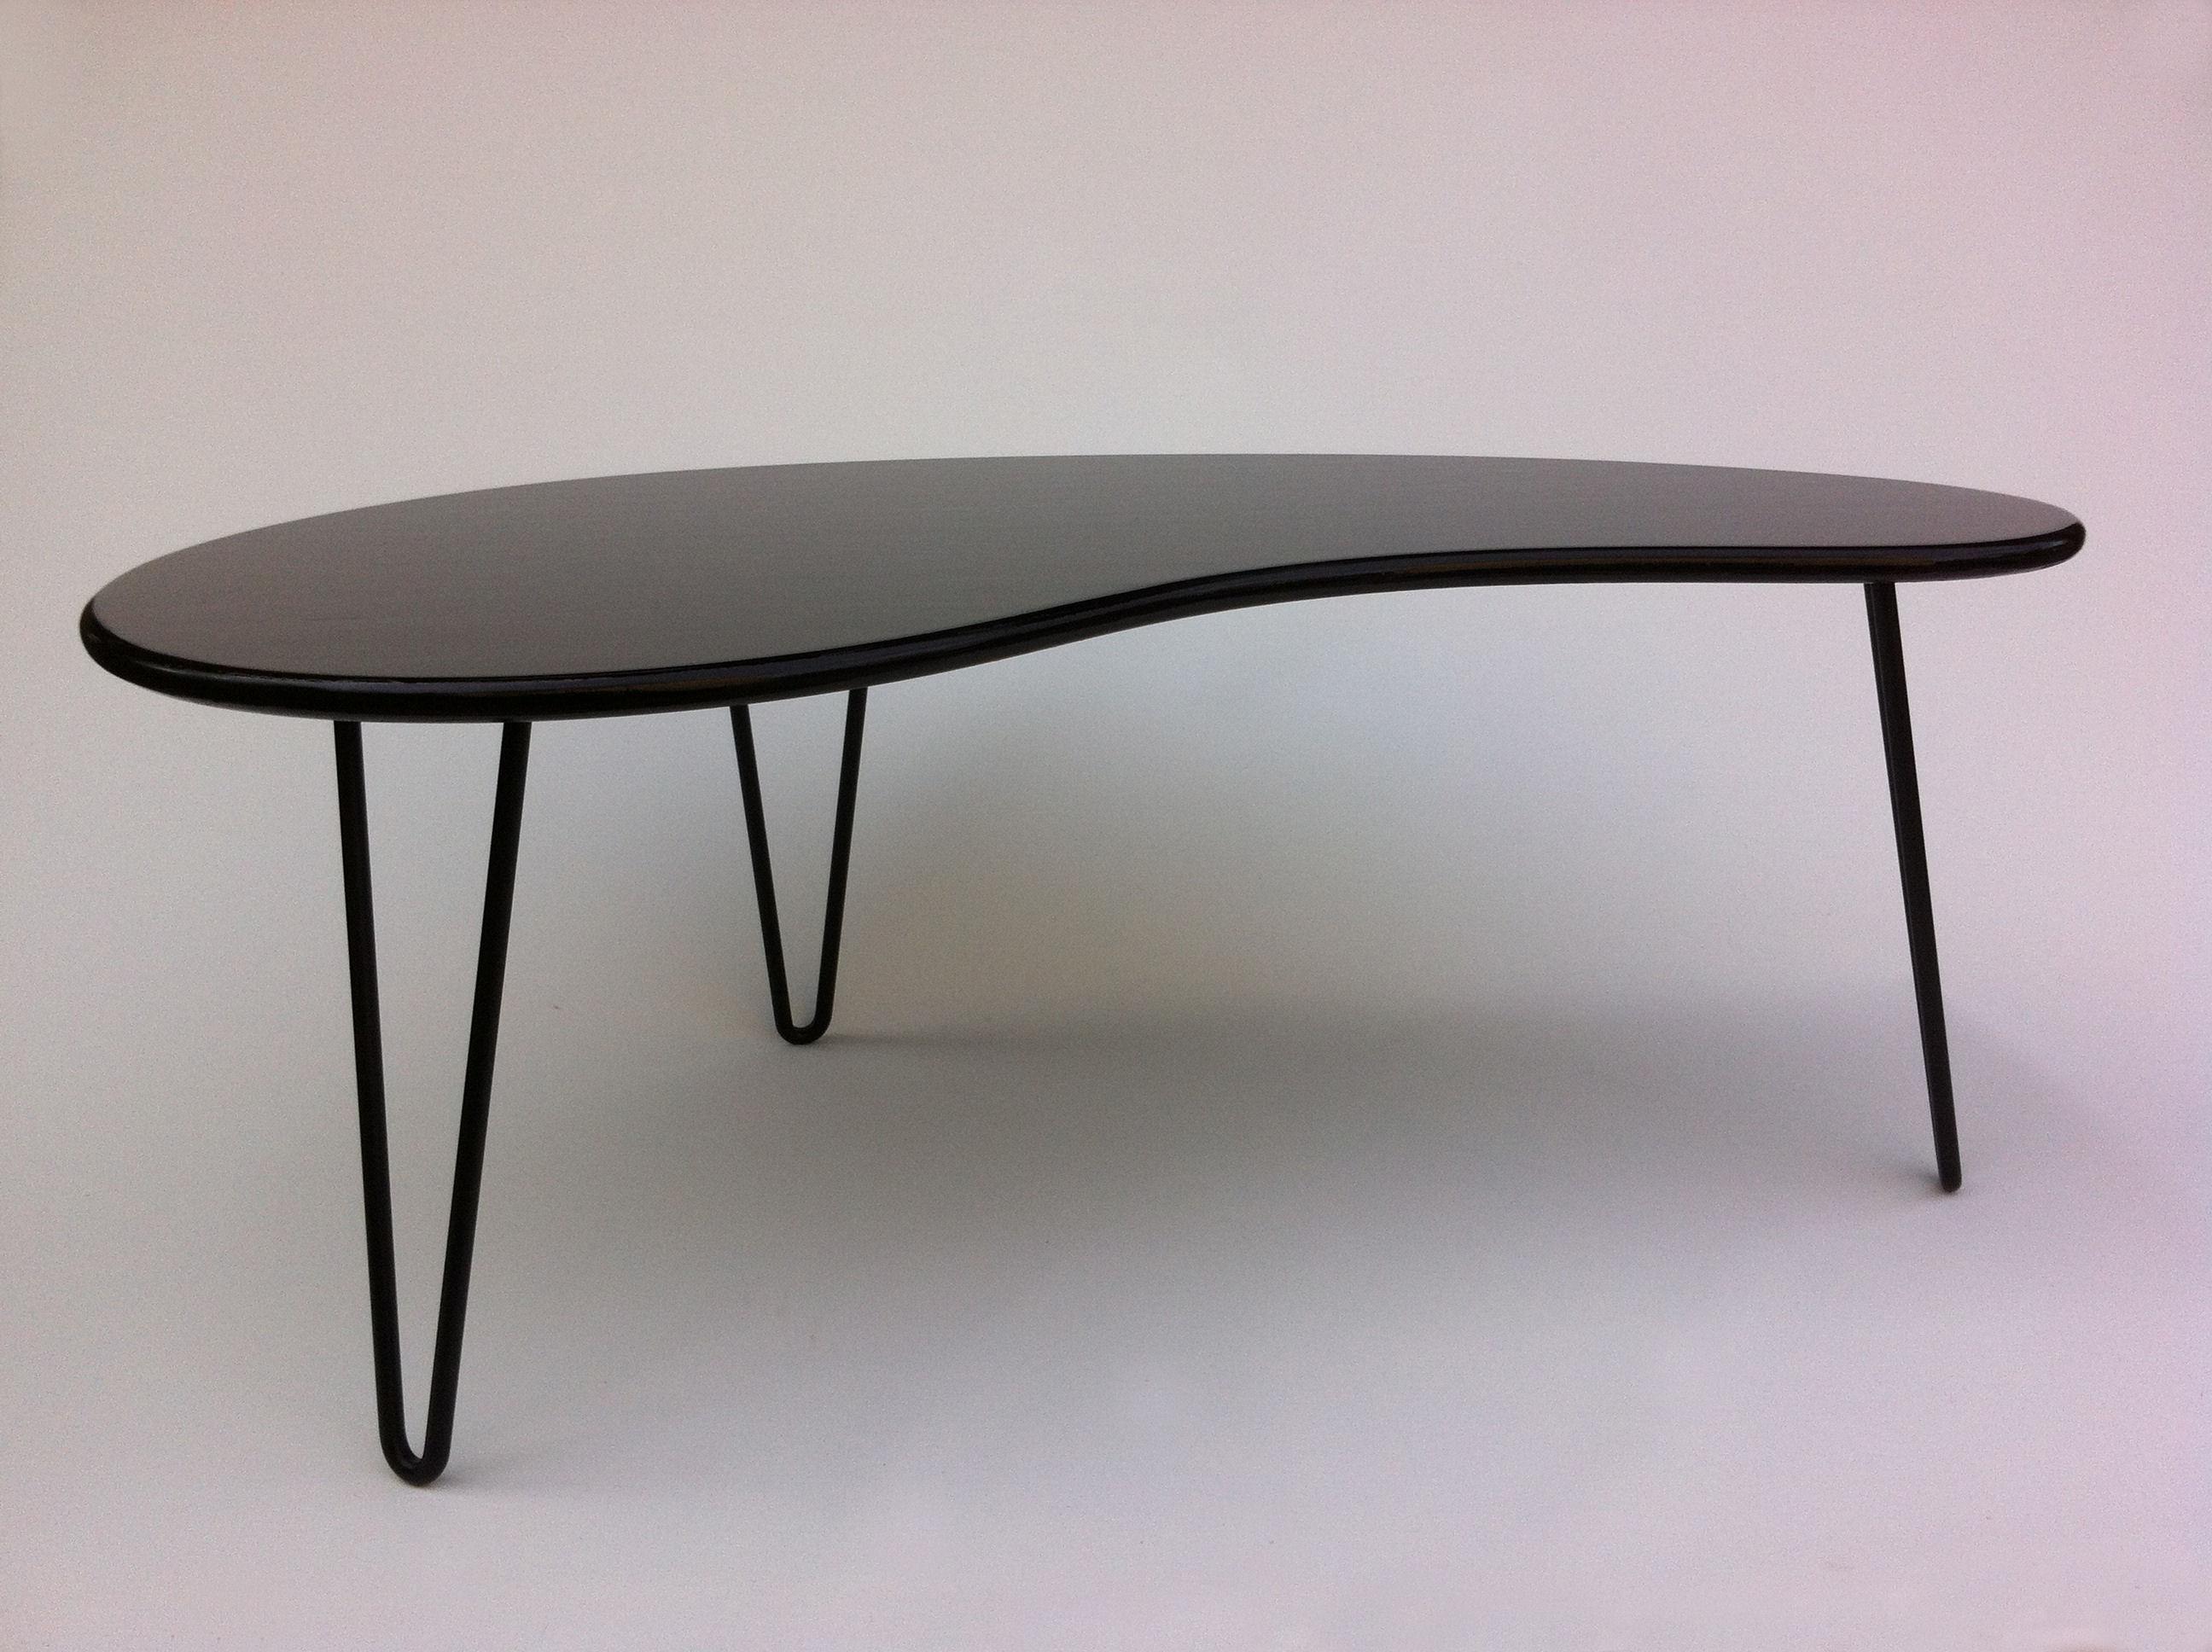 Black MidCentury Kidney Bean Shaped Coffee Table Chairish